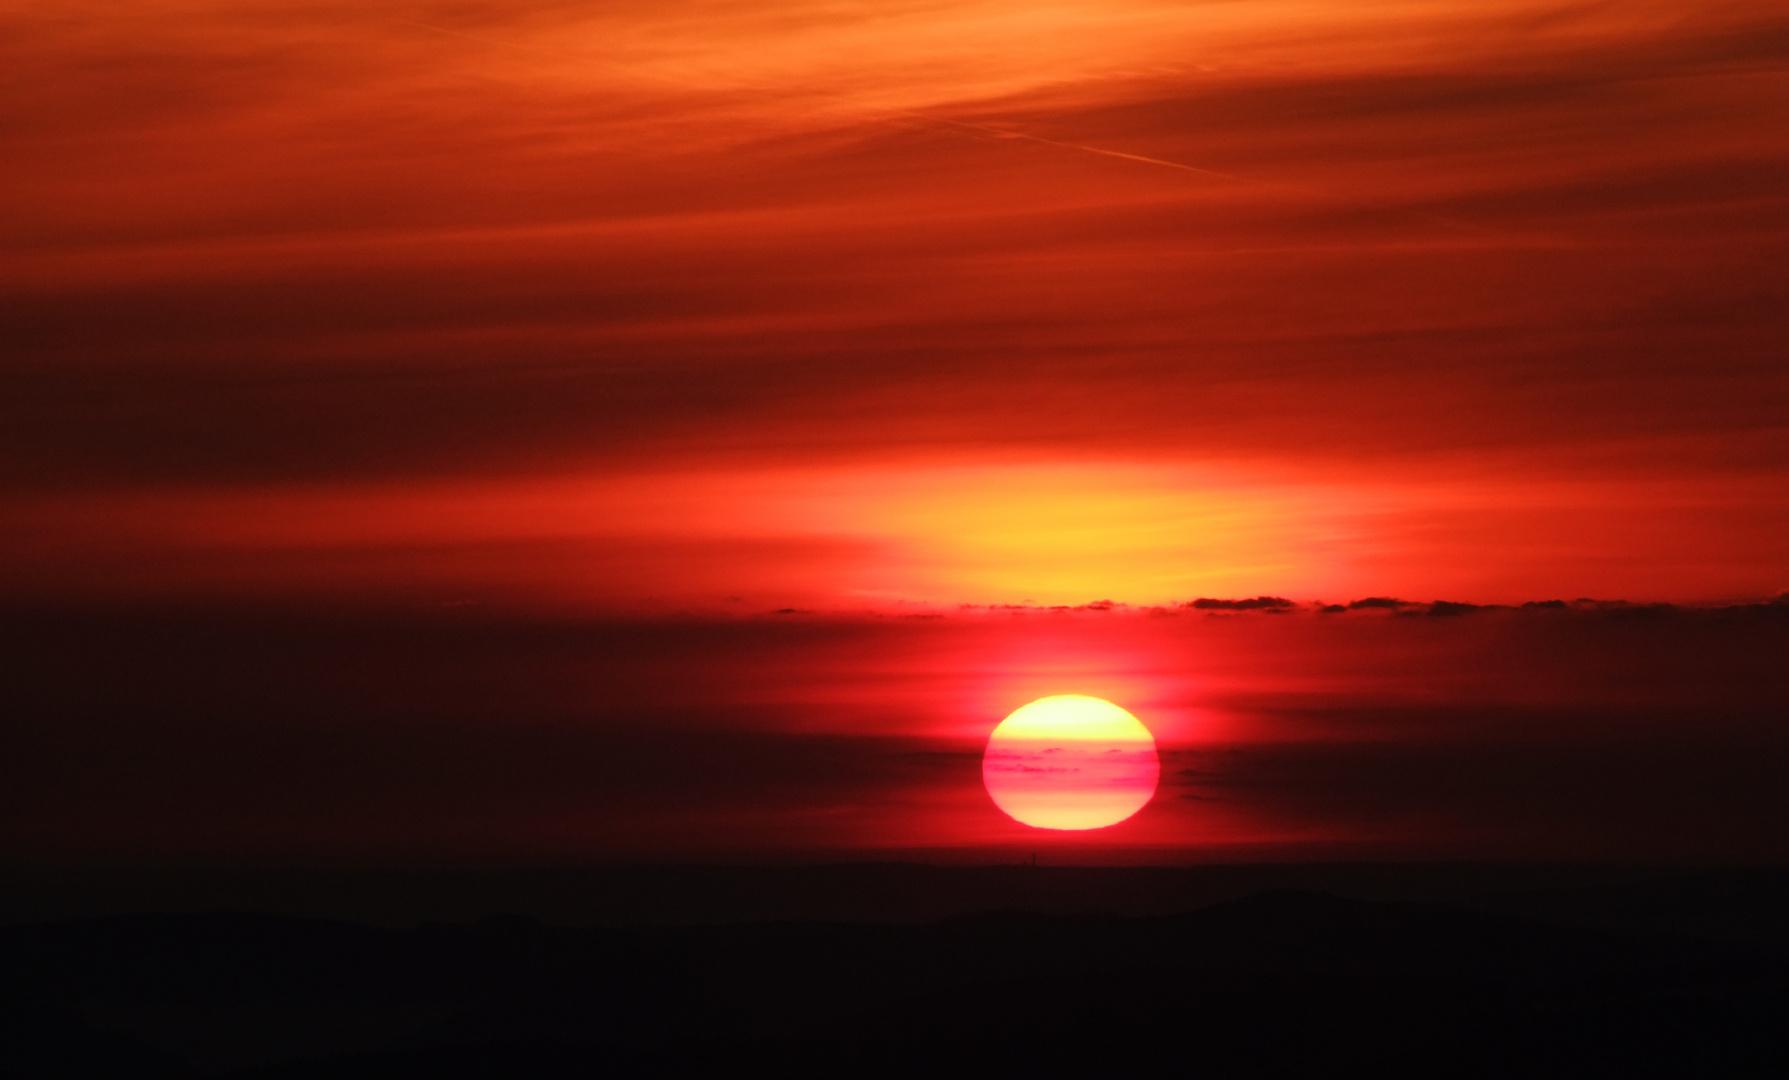 Himmel und Morgenröte